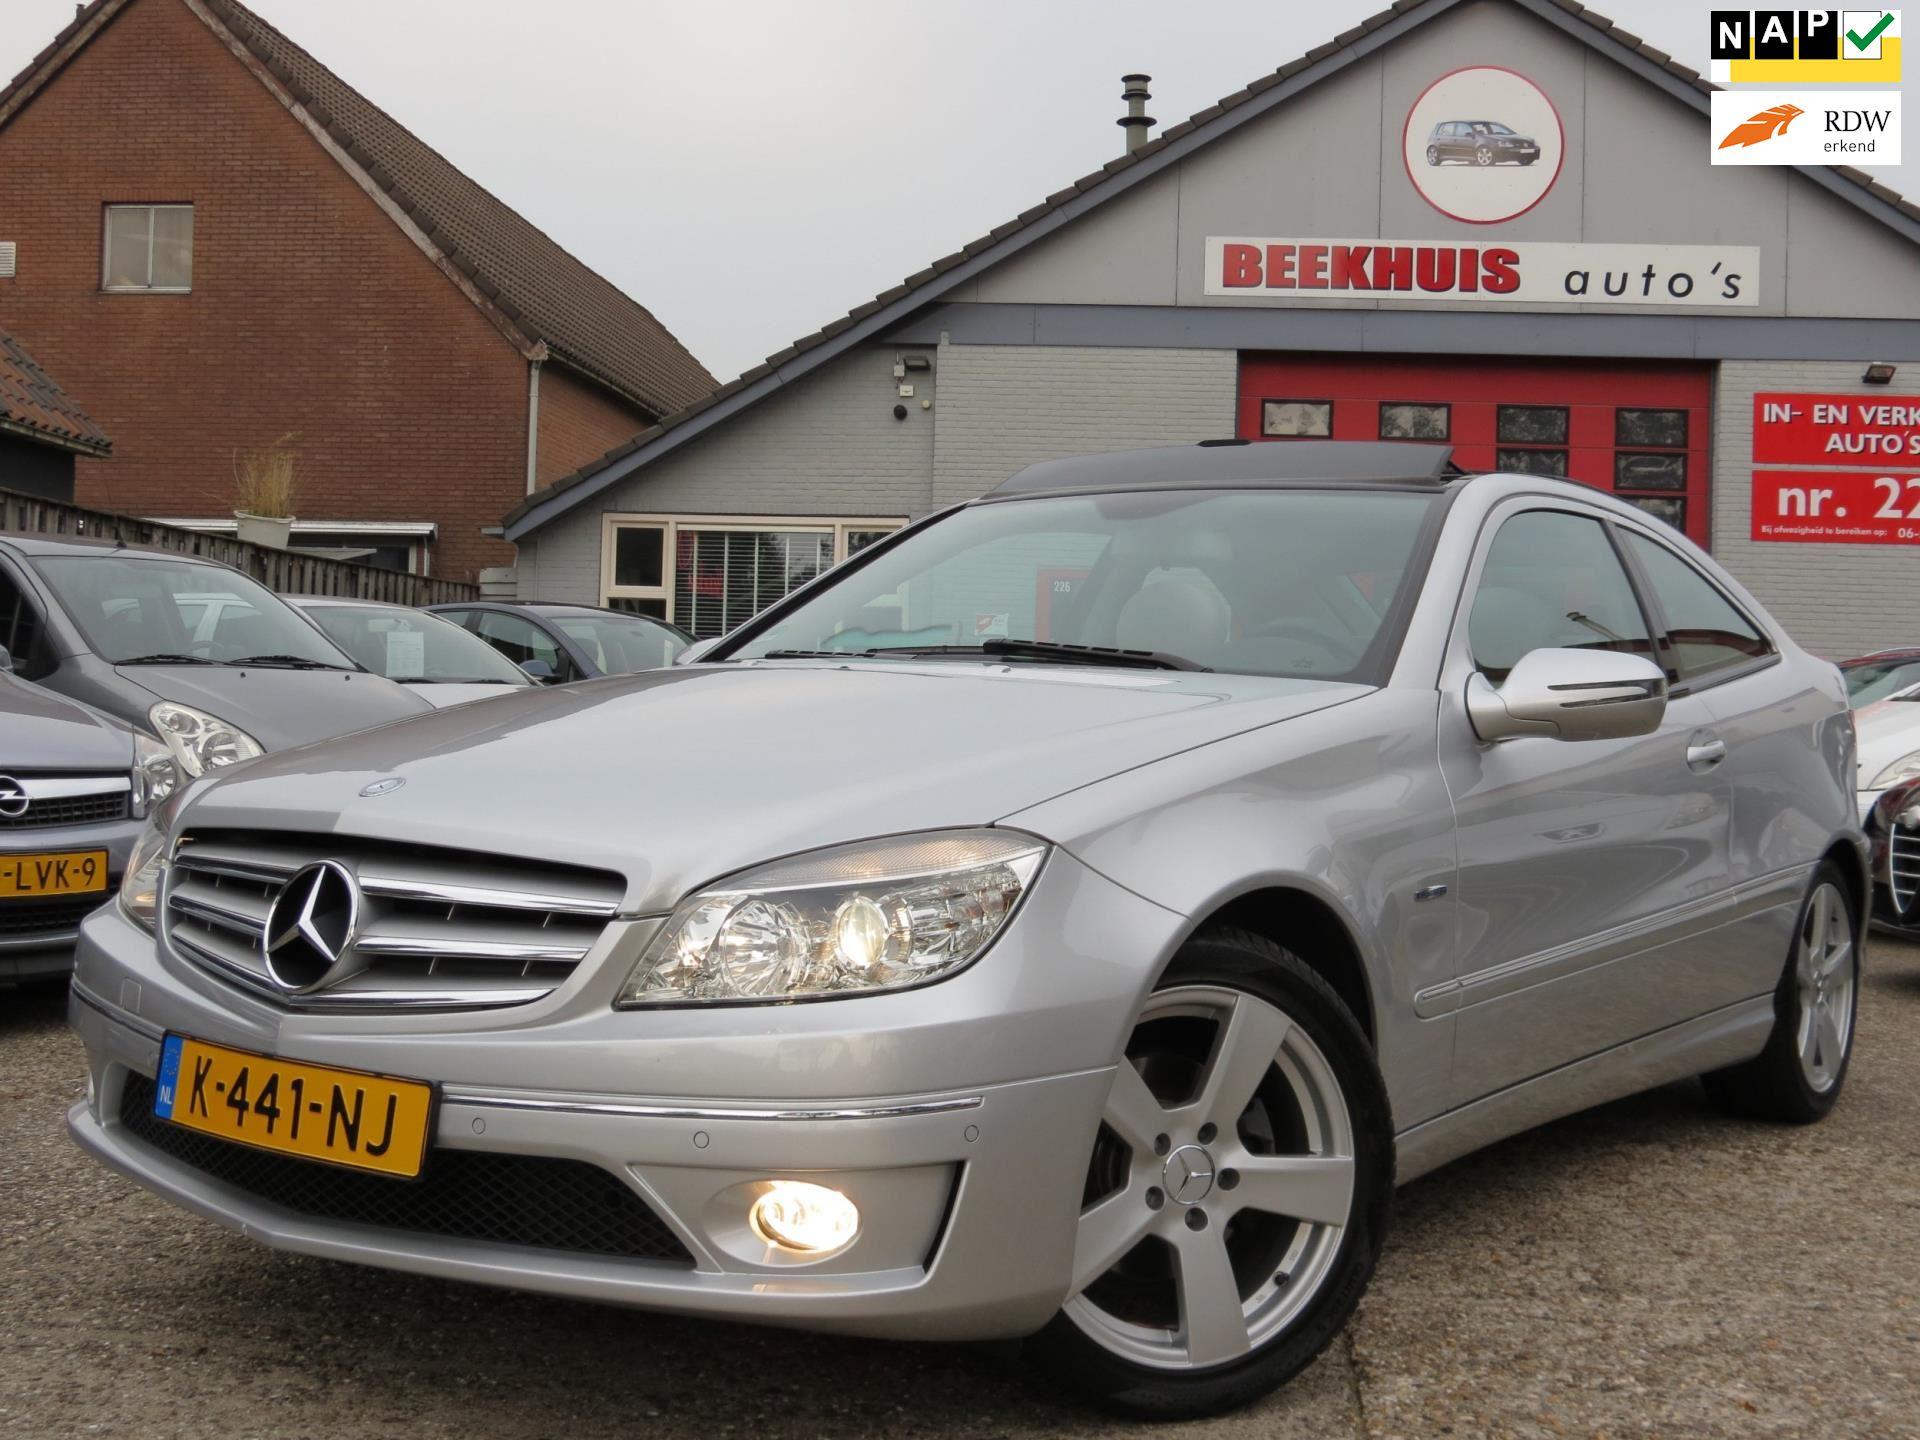 Mercedes-Benz CLC-klasse occasion - Beekhuis Auto's